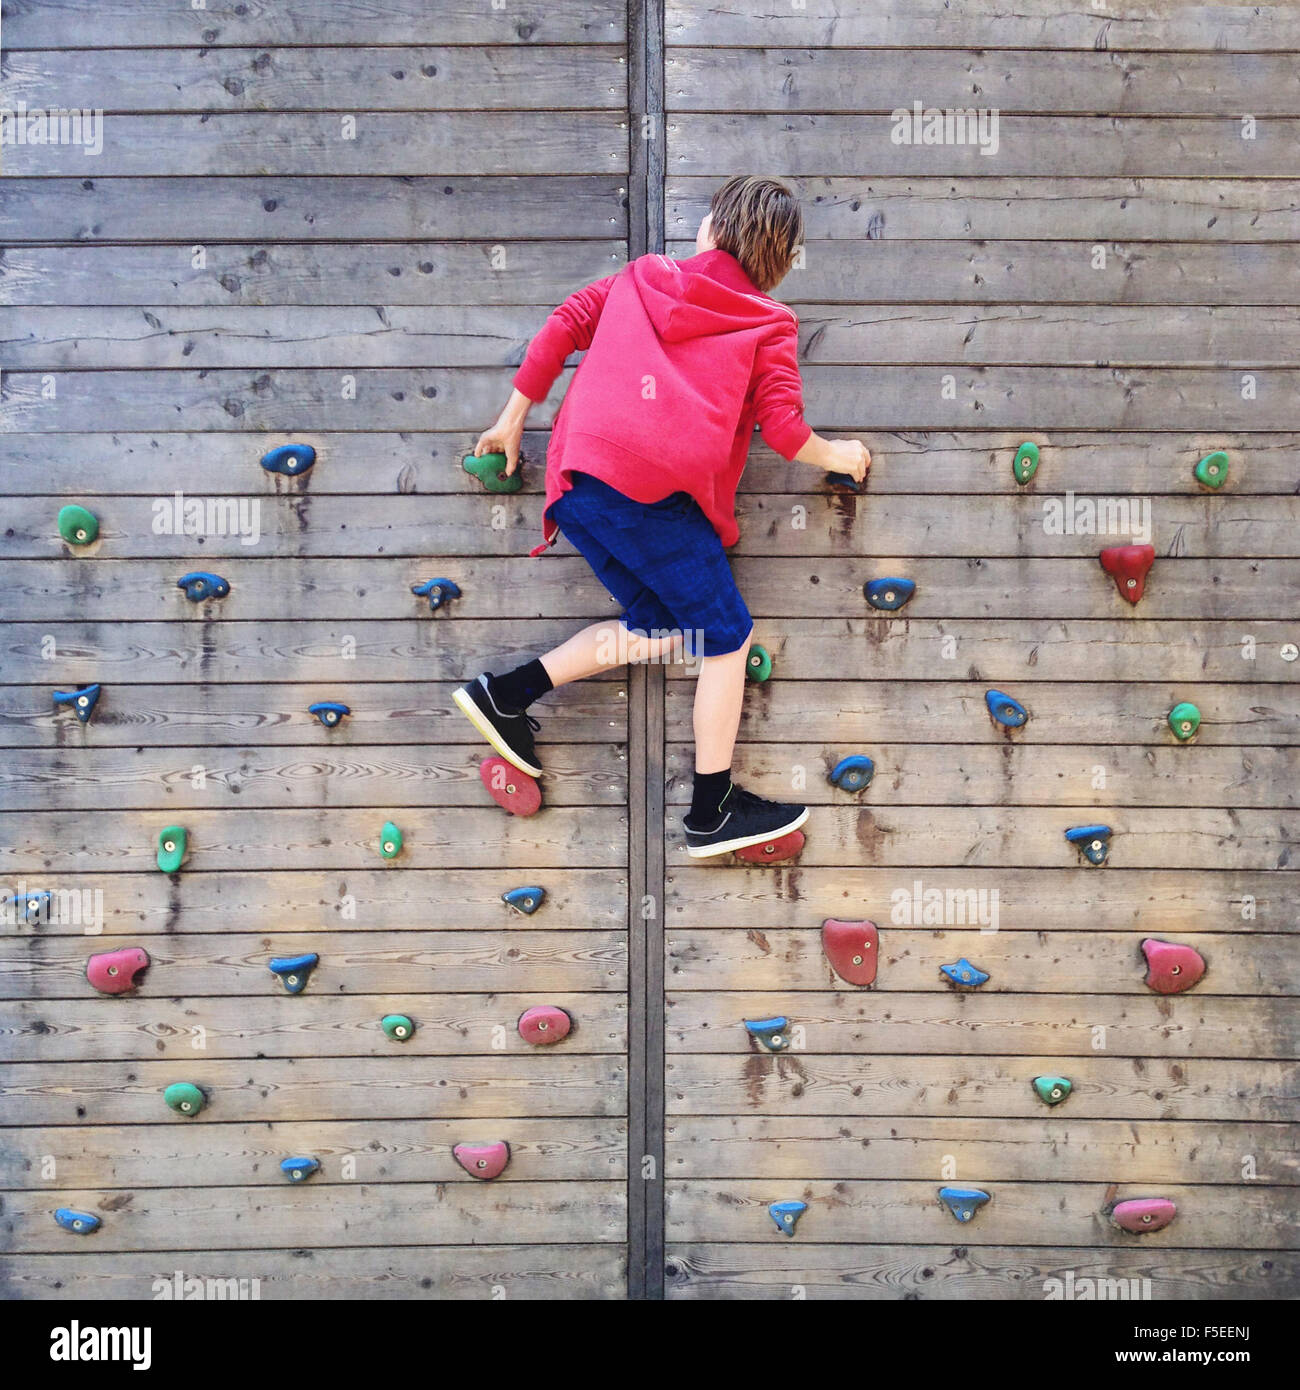 Boy climbing on climbing wall - Stock Image